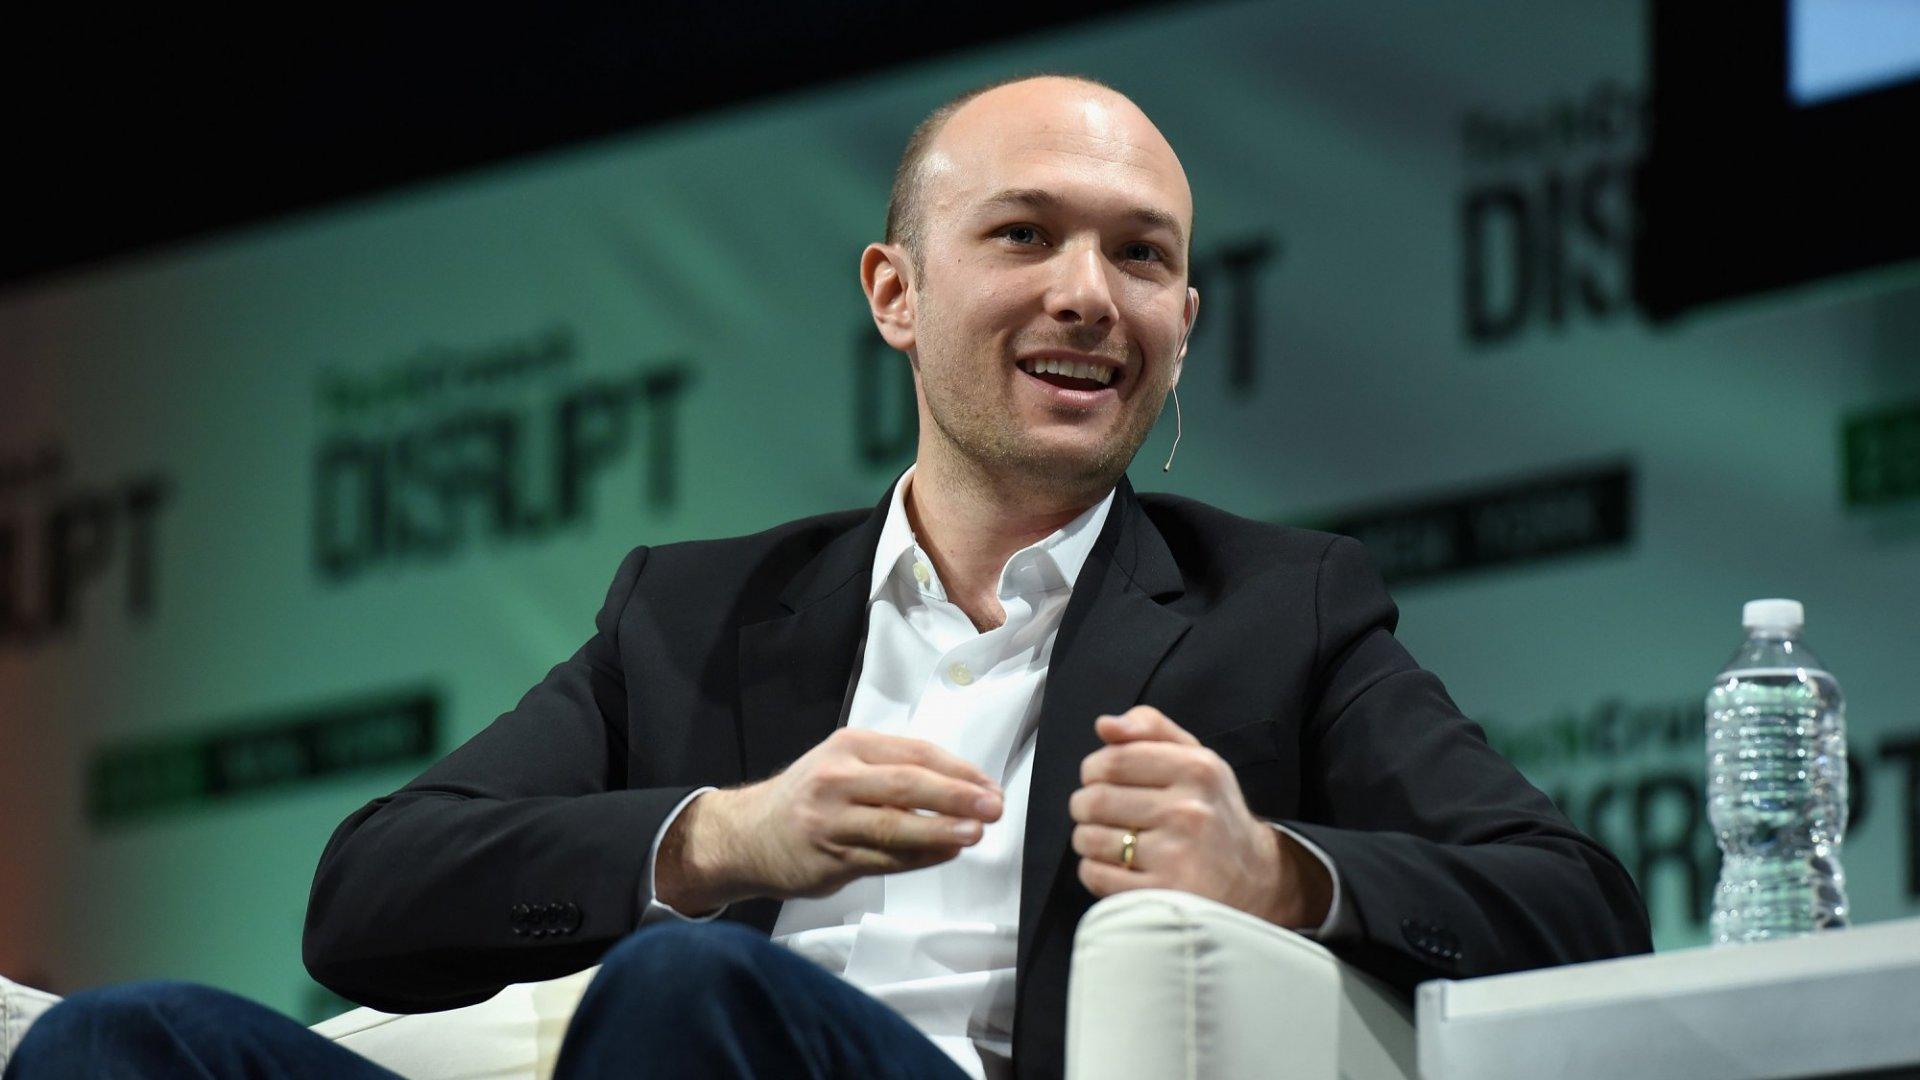 LyftChooses JPMorgan to Lead Their IPO